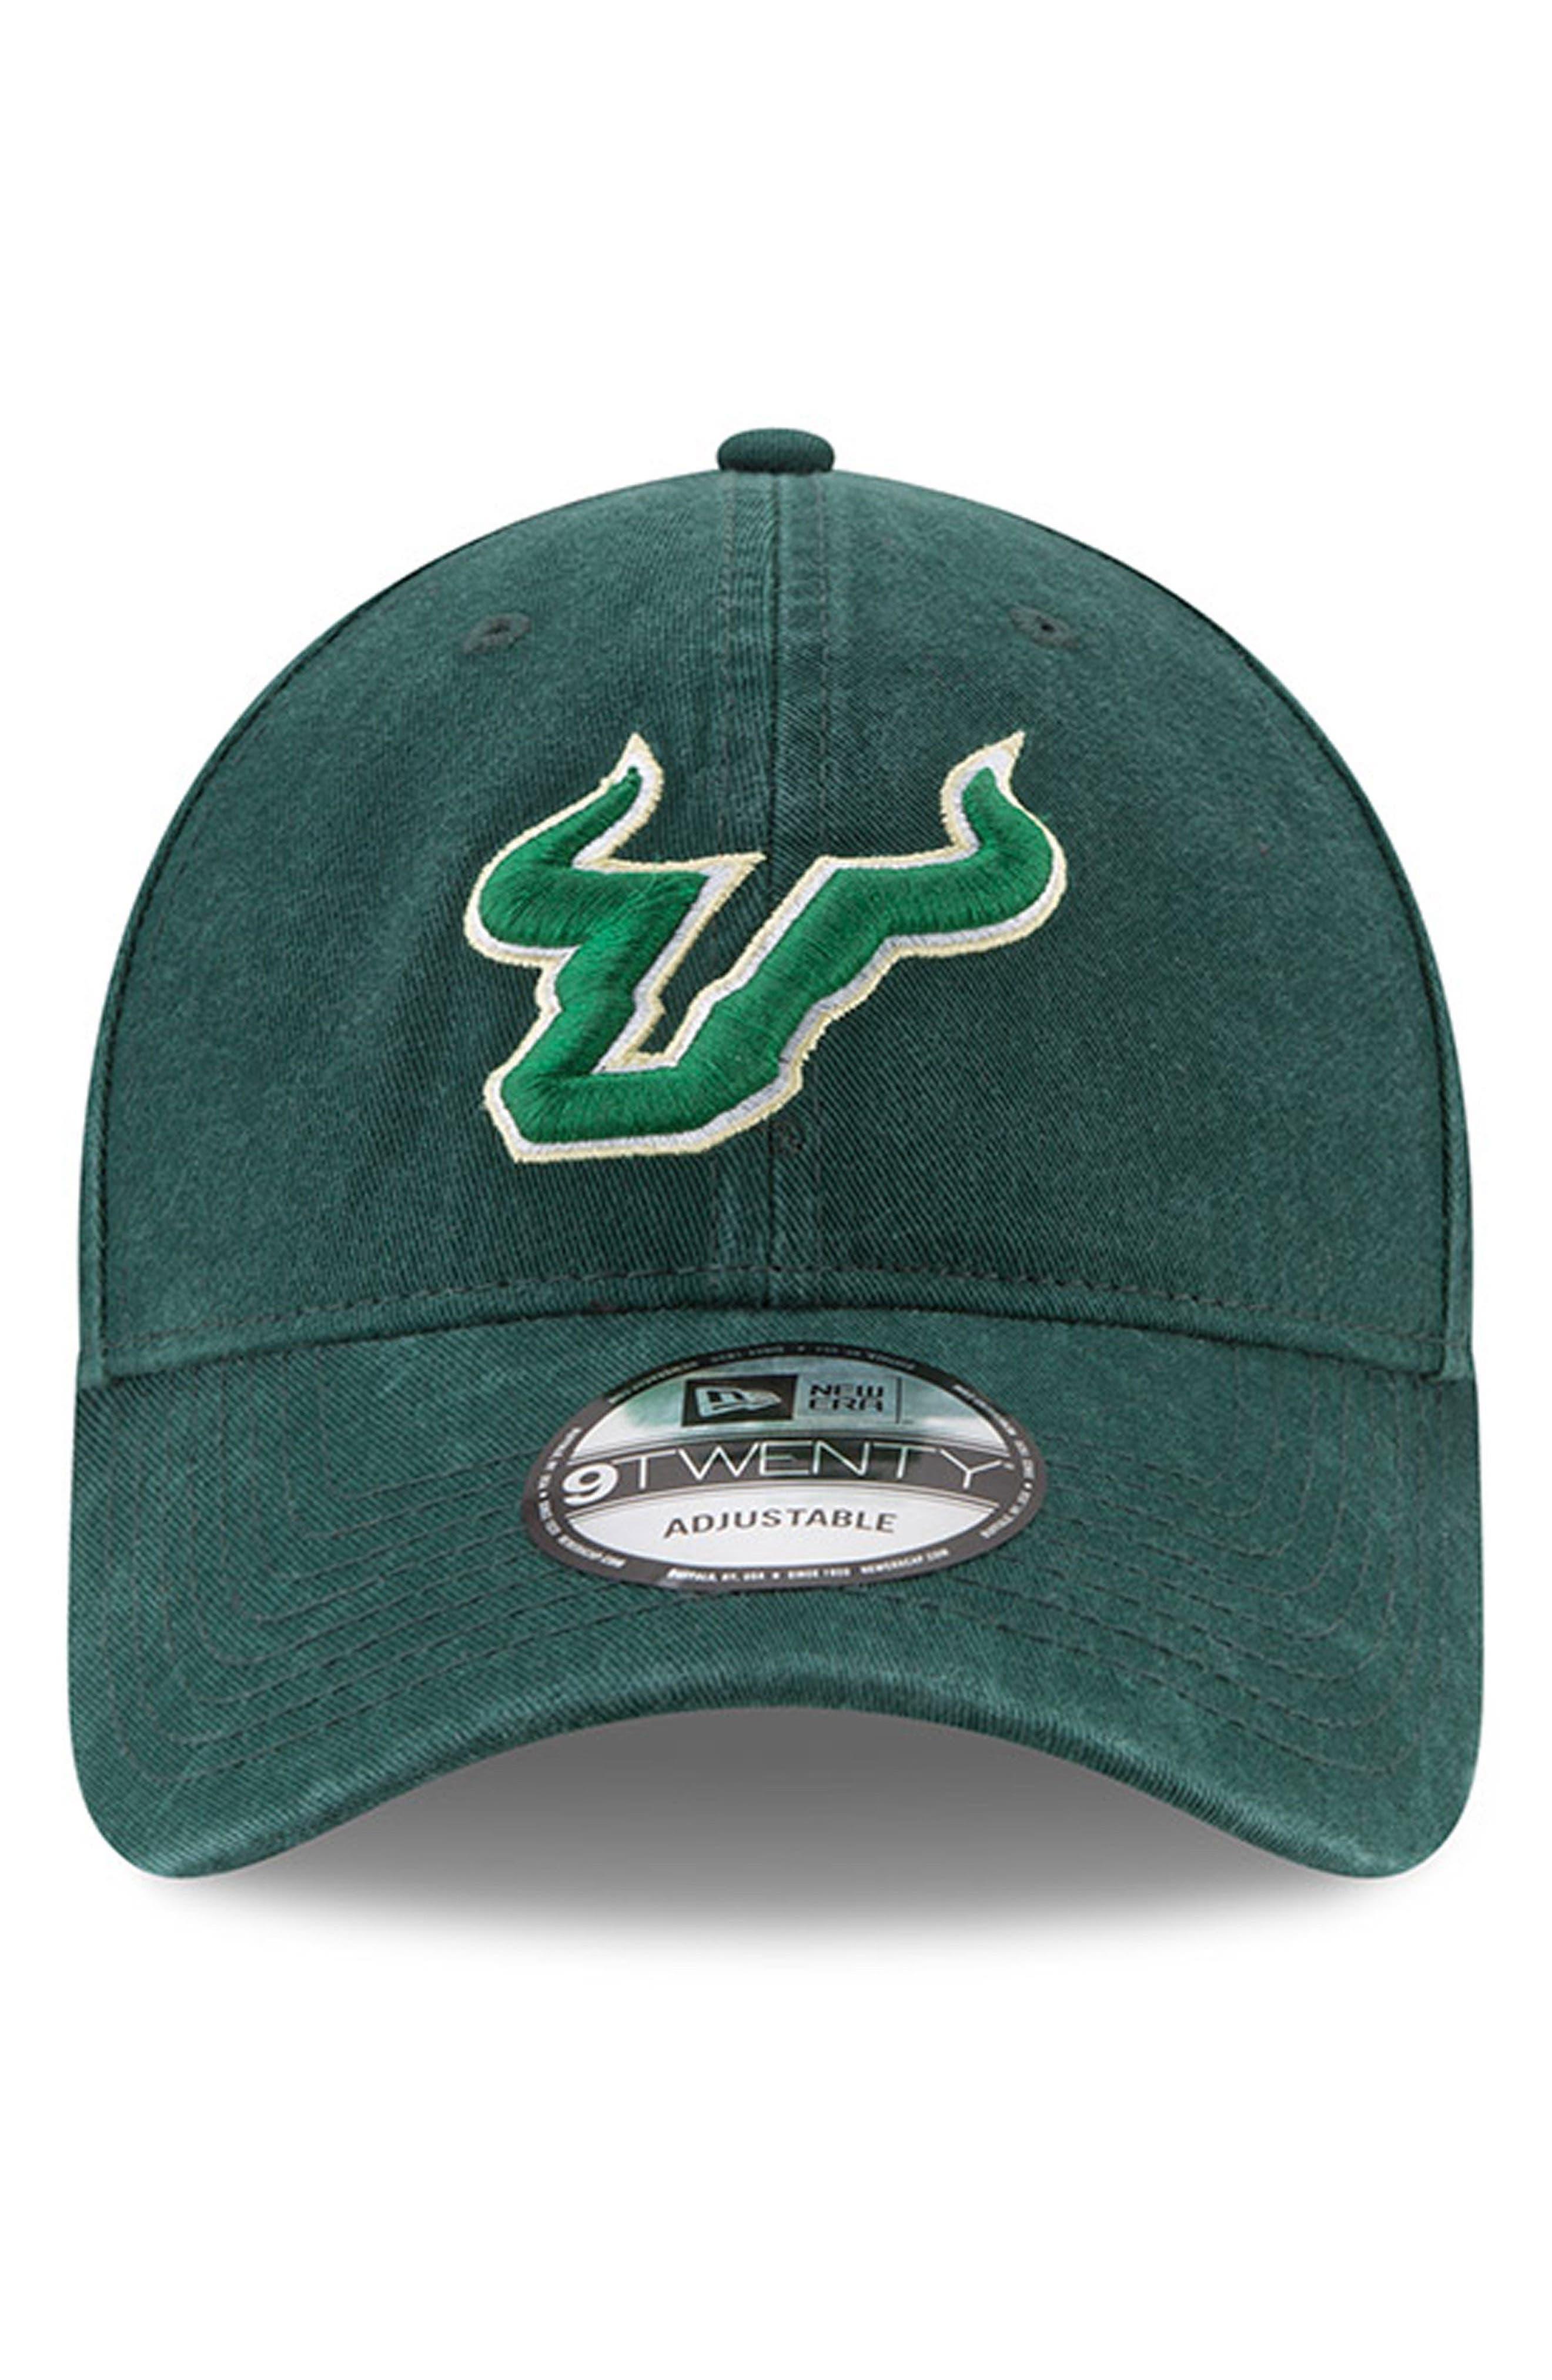 New Era Collegiate Core Classic - South Florida Bulls Baseball Cap,                             Alternate thumbnail 5, color,                             South Florida Bulls